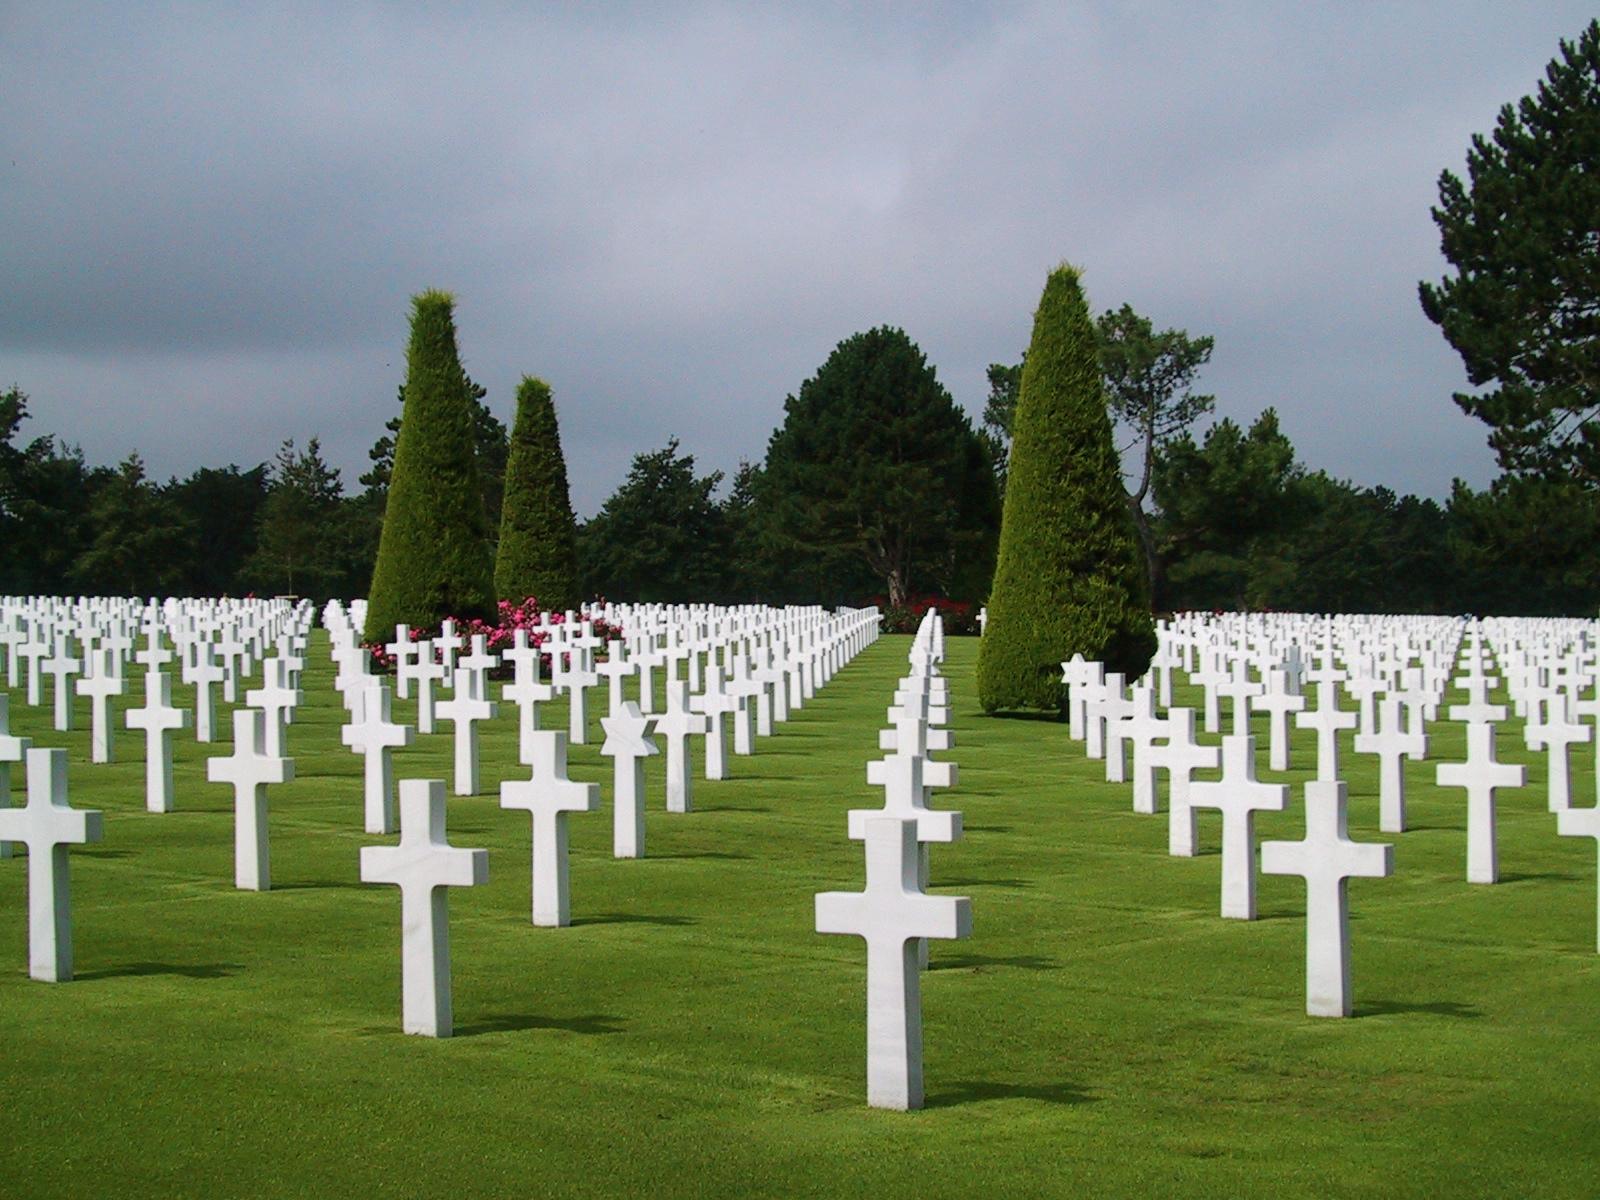 cemetery, death